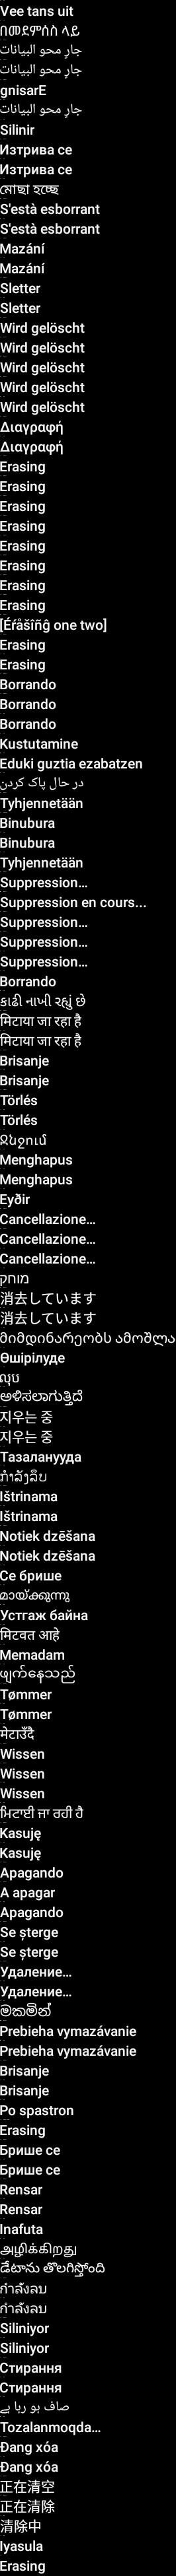 res-hdpi/images/erasing_text.png